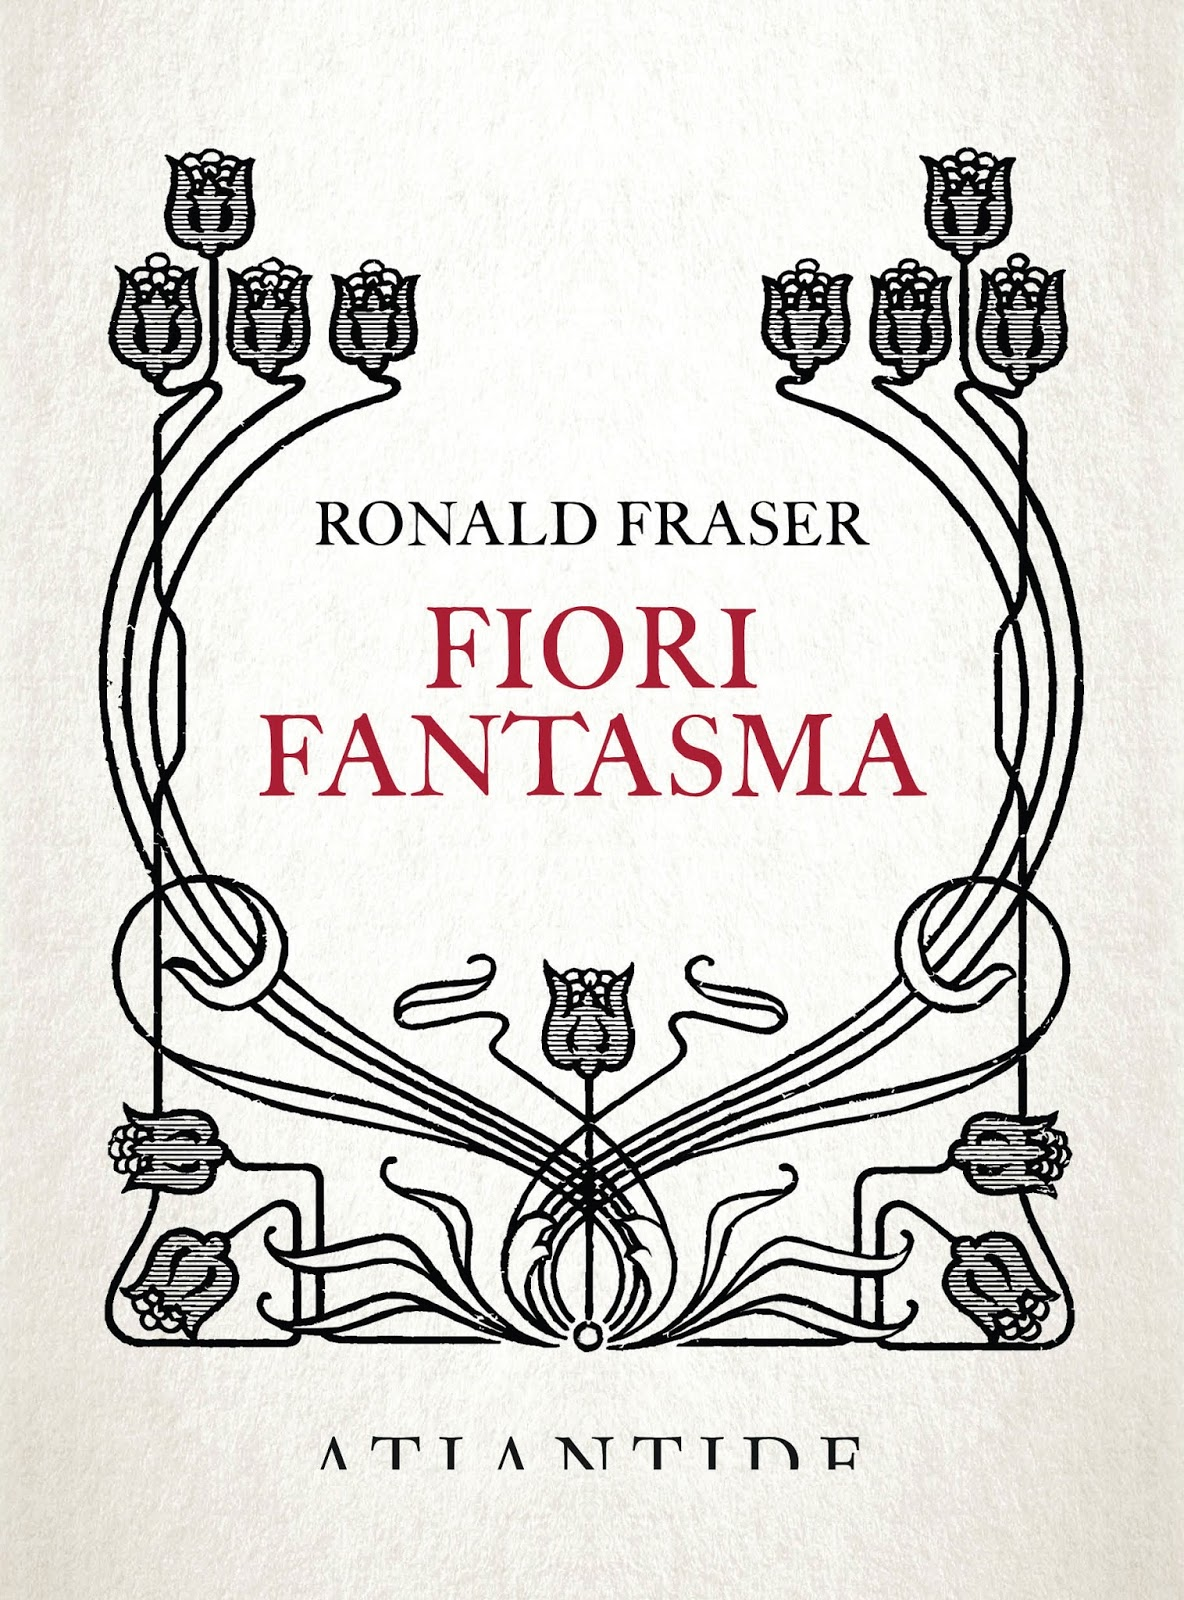 Ronald Fraser - Fiori fantasma